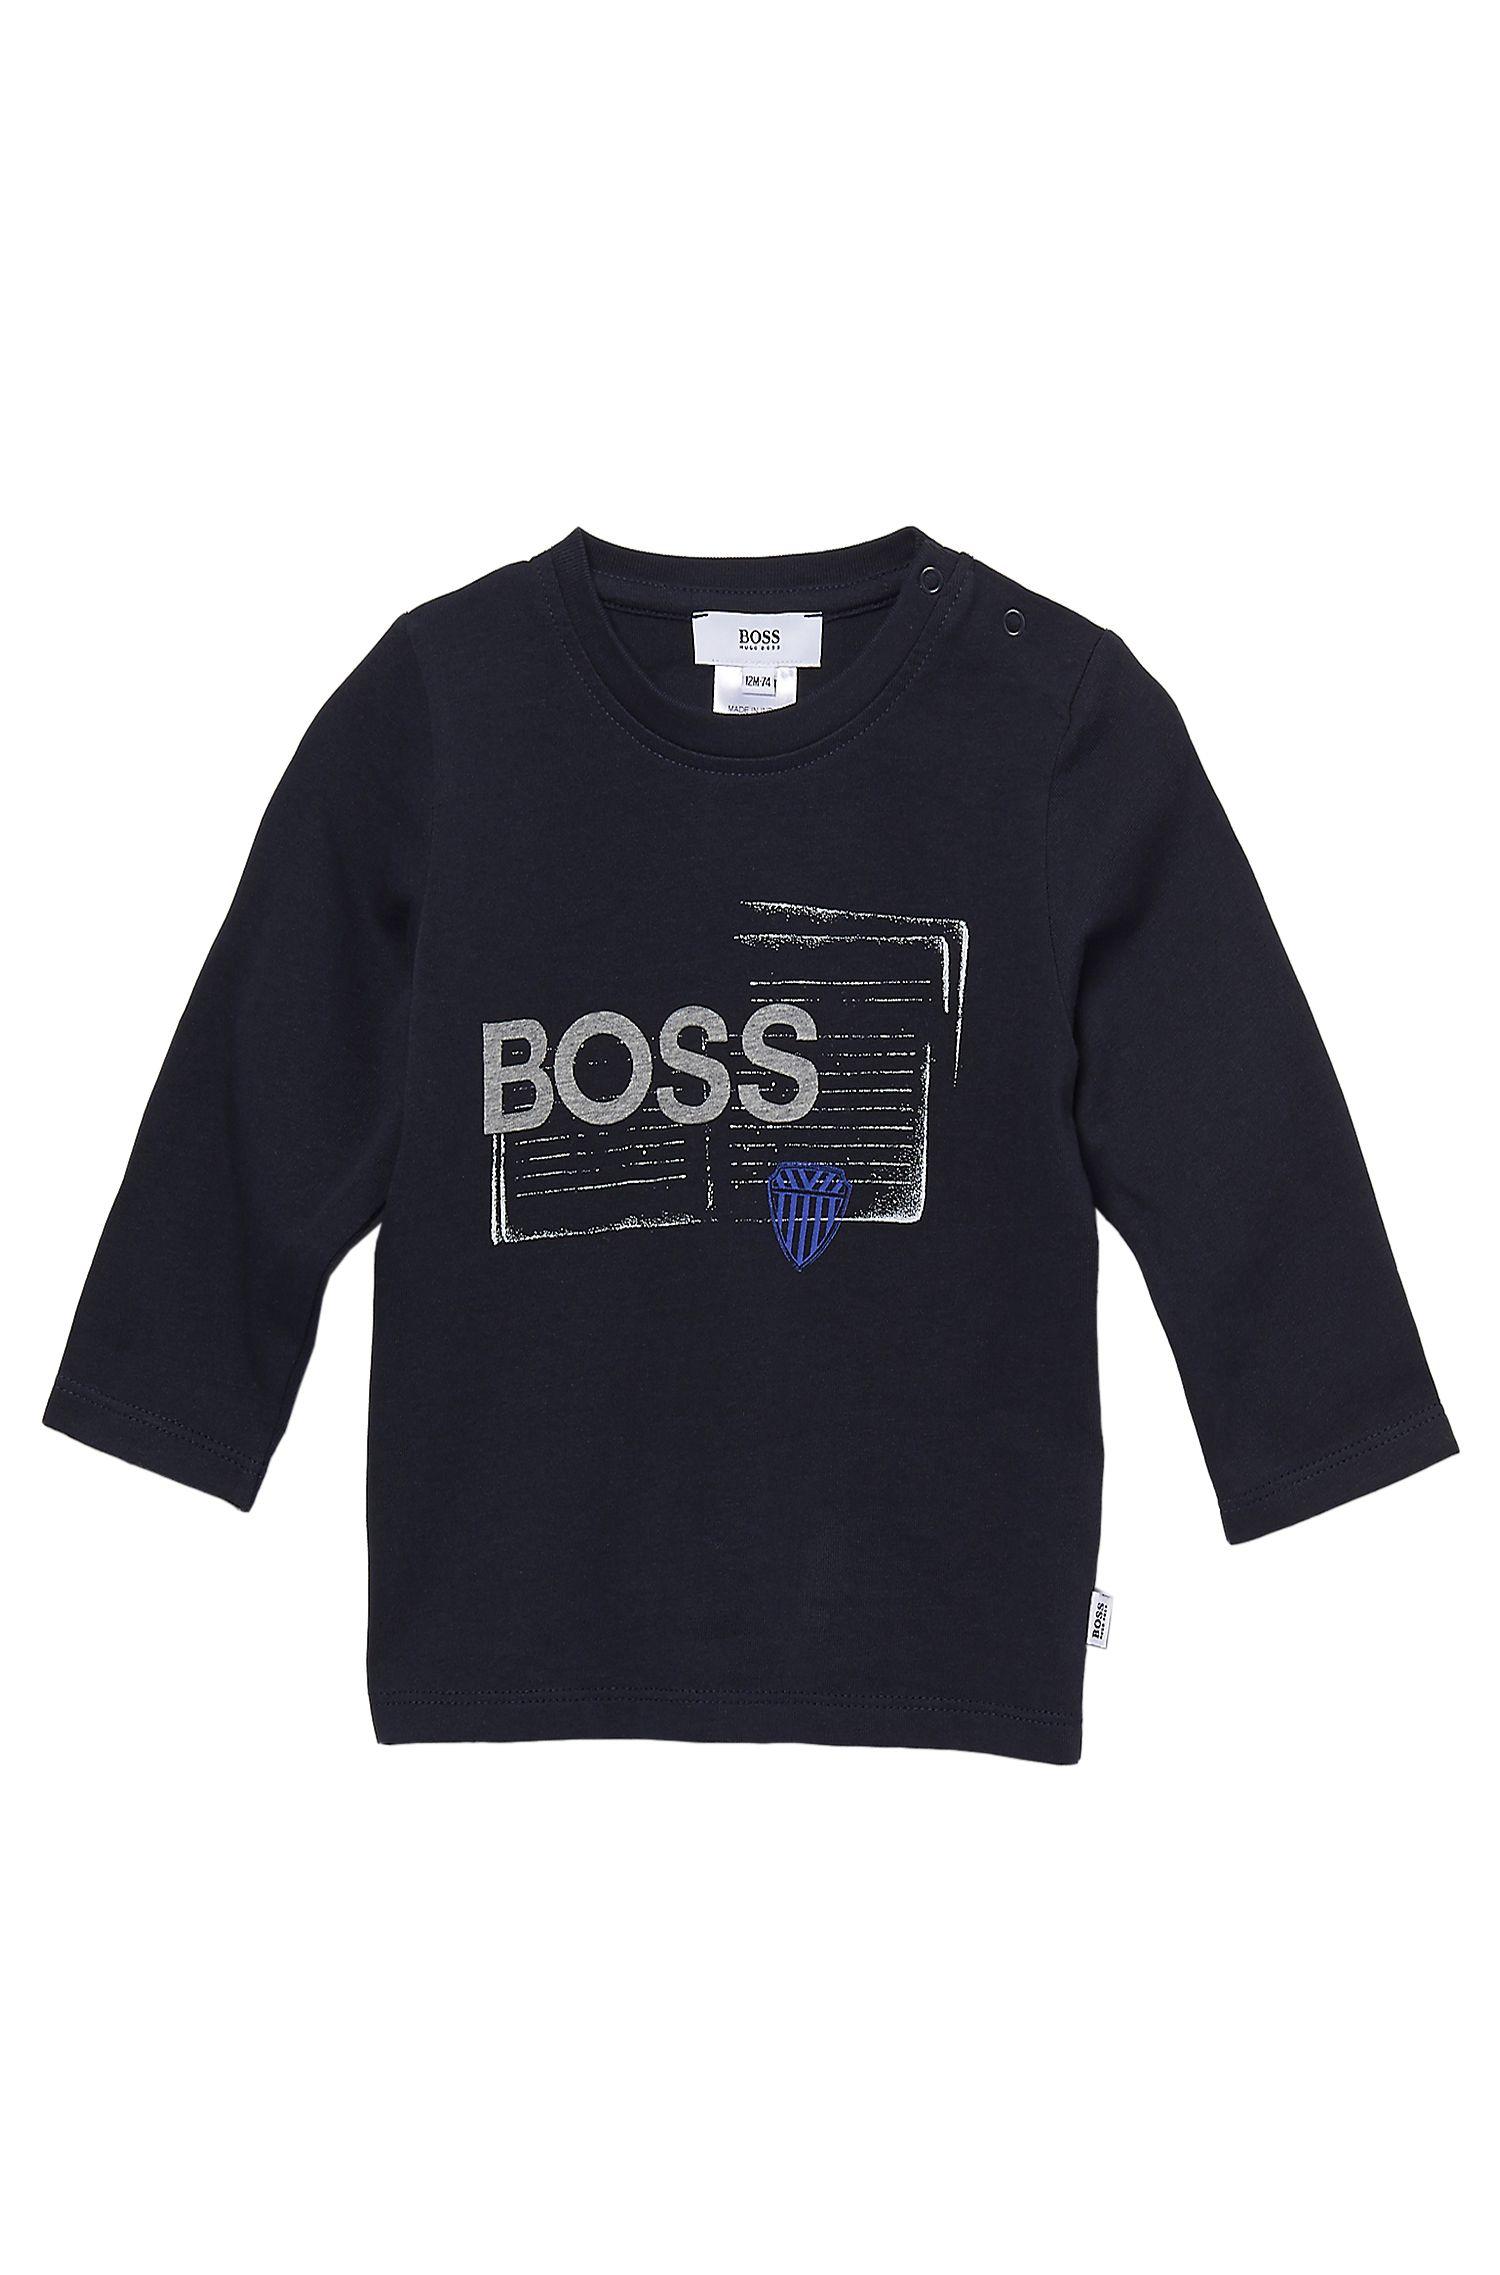 'J05263' | Toddler Long-Sleeved Cotton Print Crewneck T-Shirt